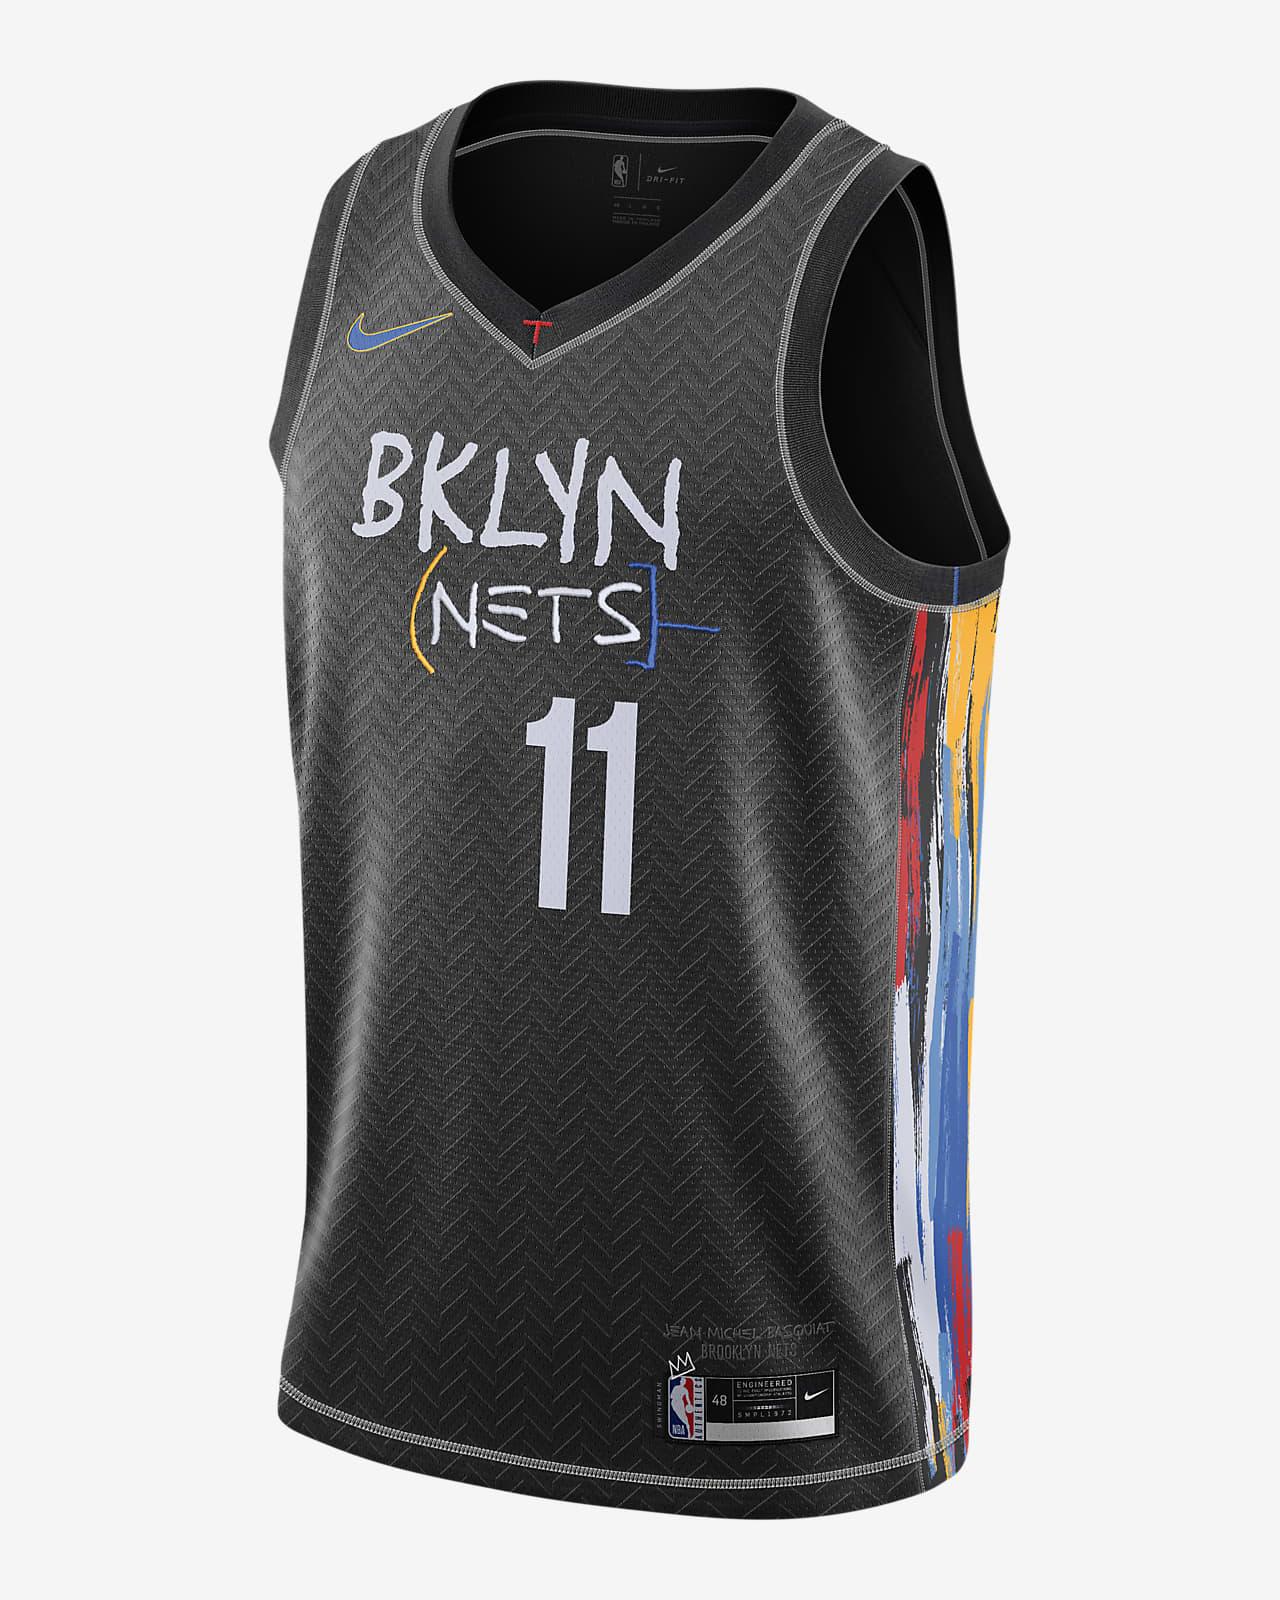 Camiseta Nike NBA Swingman Brooklyn Nets City Edition